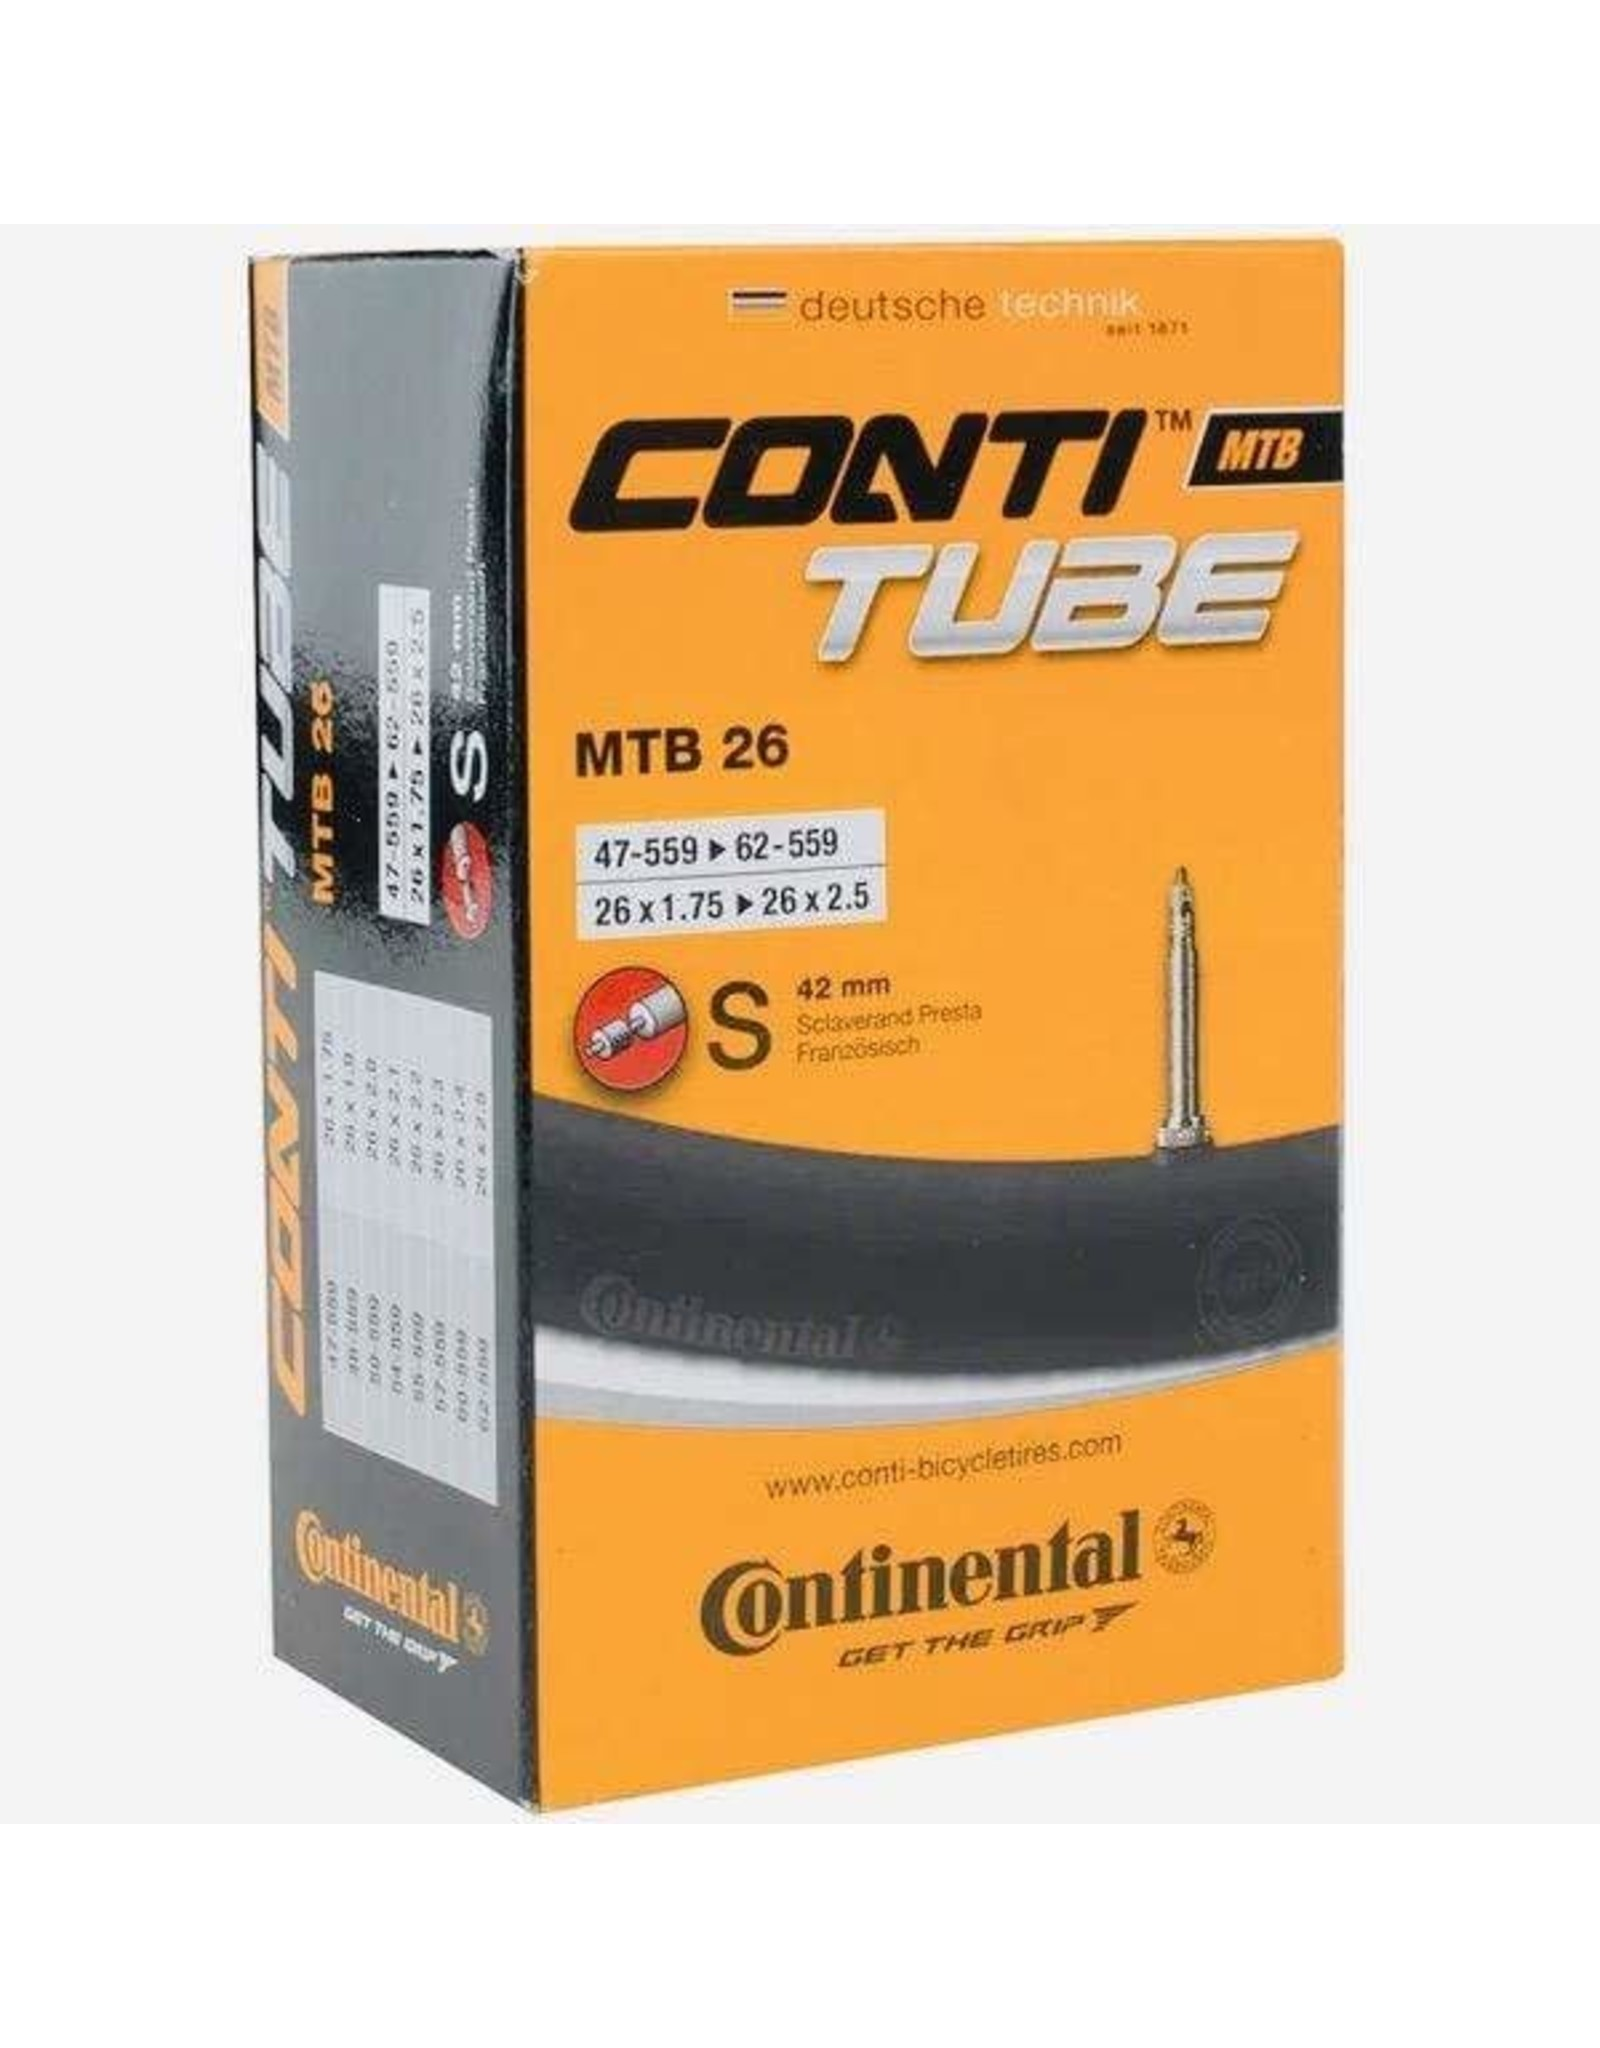 "Continental Continental Tube 26 x 1.75-2.5"" Presta, 42mm valve"